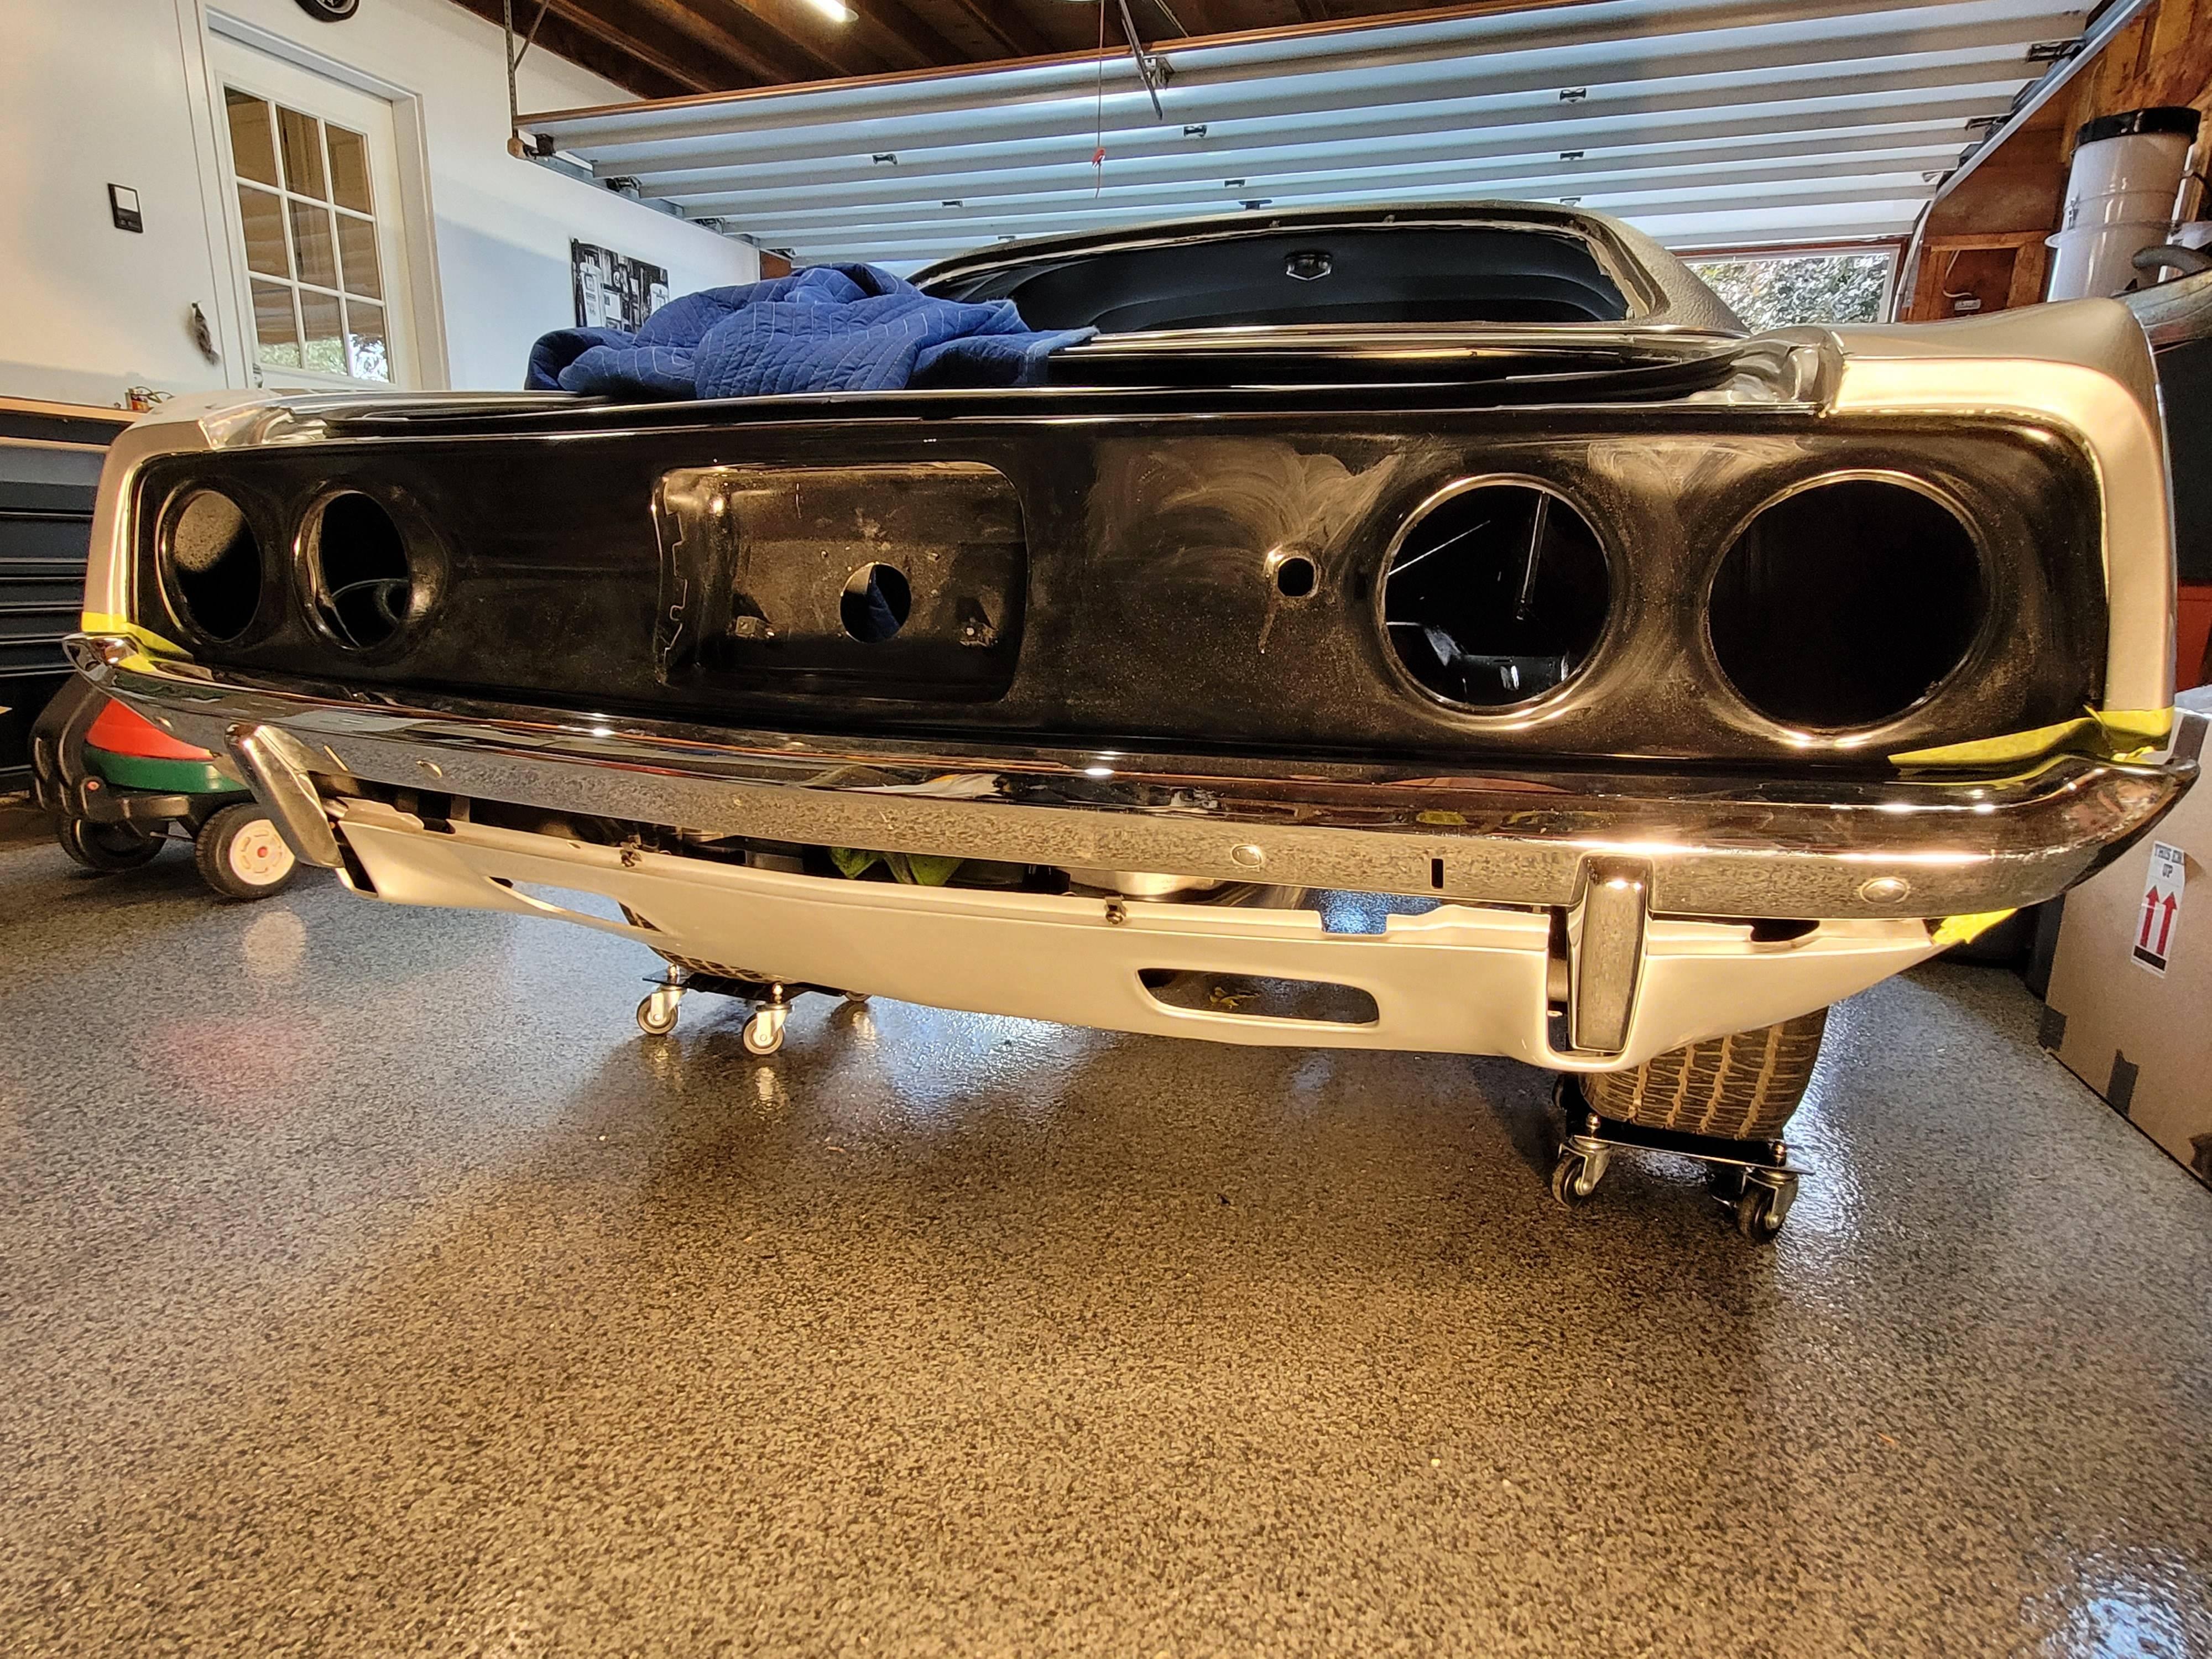 Cuda Rear Bumper & Valance Pic #6.jpg